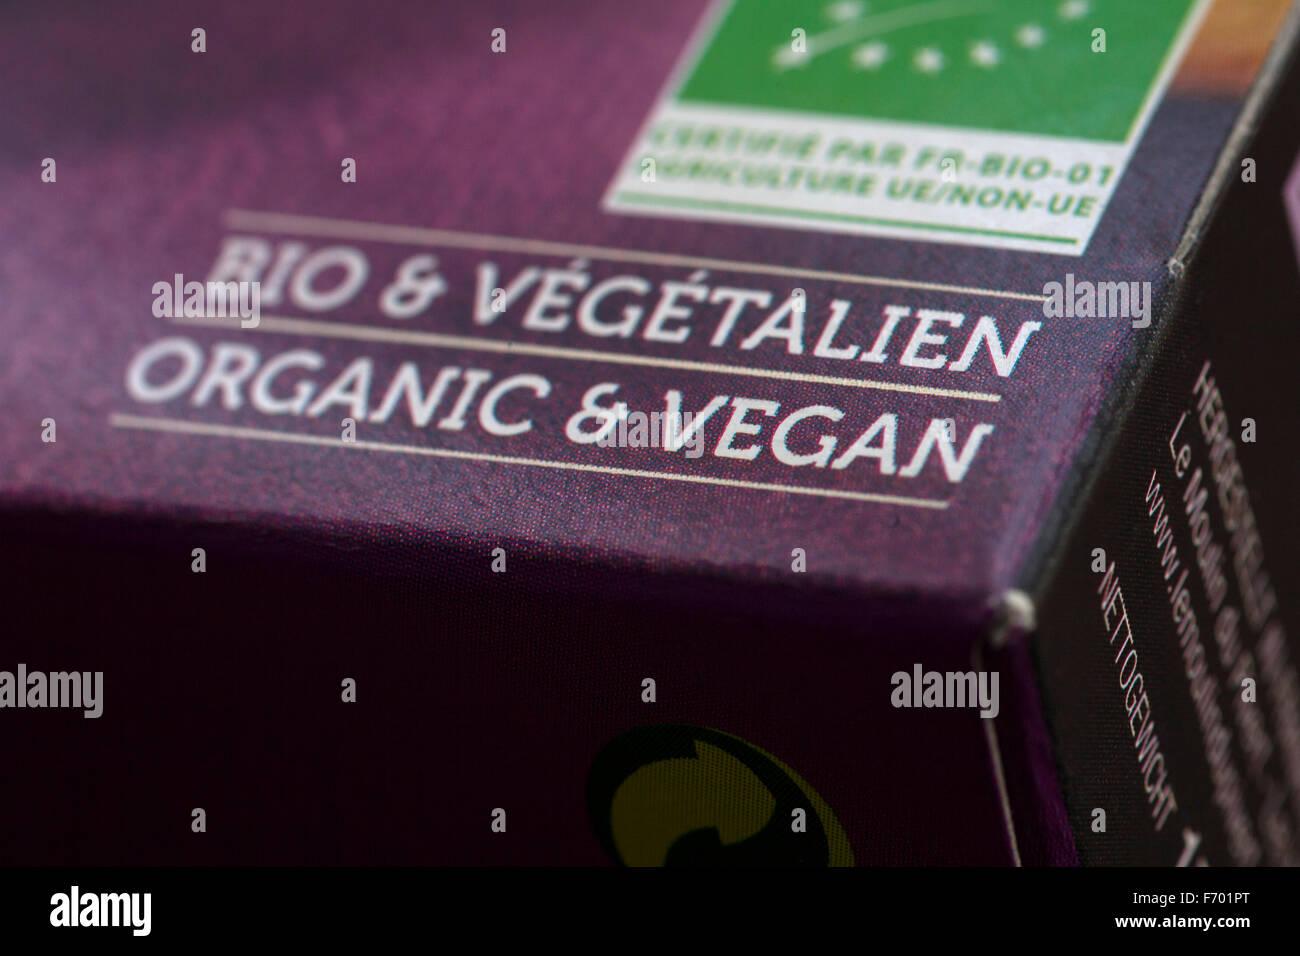 Französische veganes Produkt Stockbild